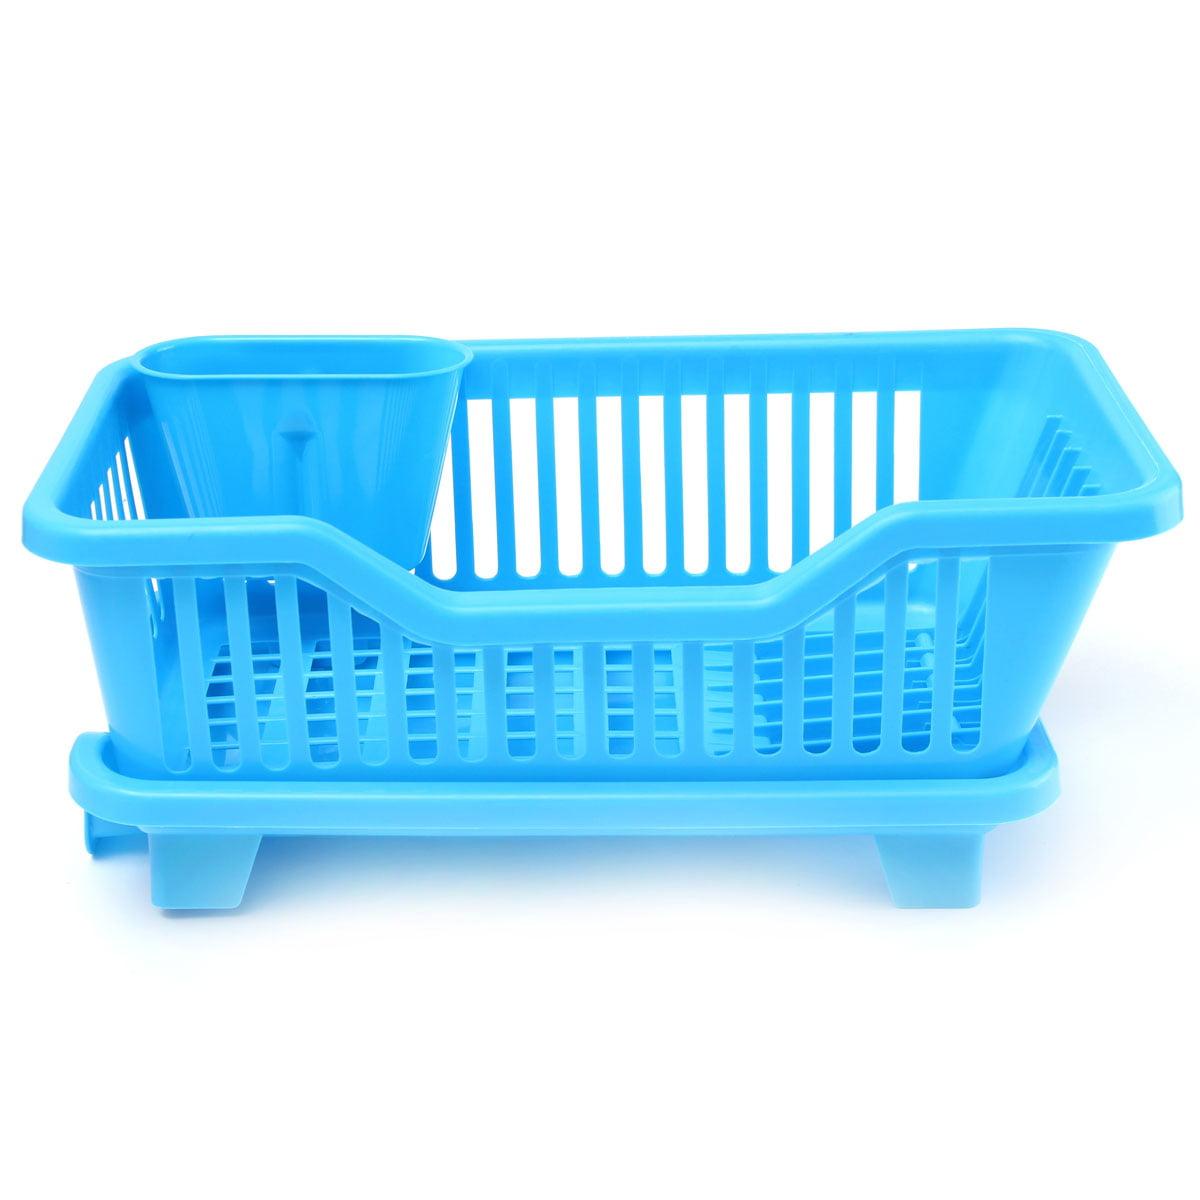 MOHOO Kitchen Dish Drainer Drying Rack Washing Holder Basket ...